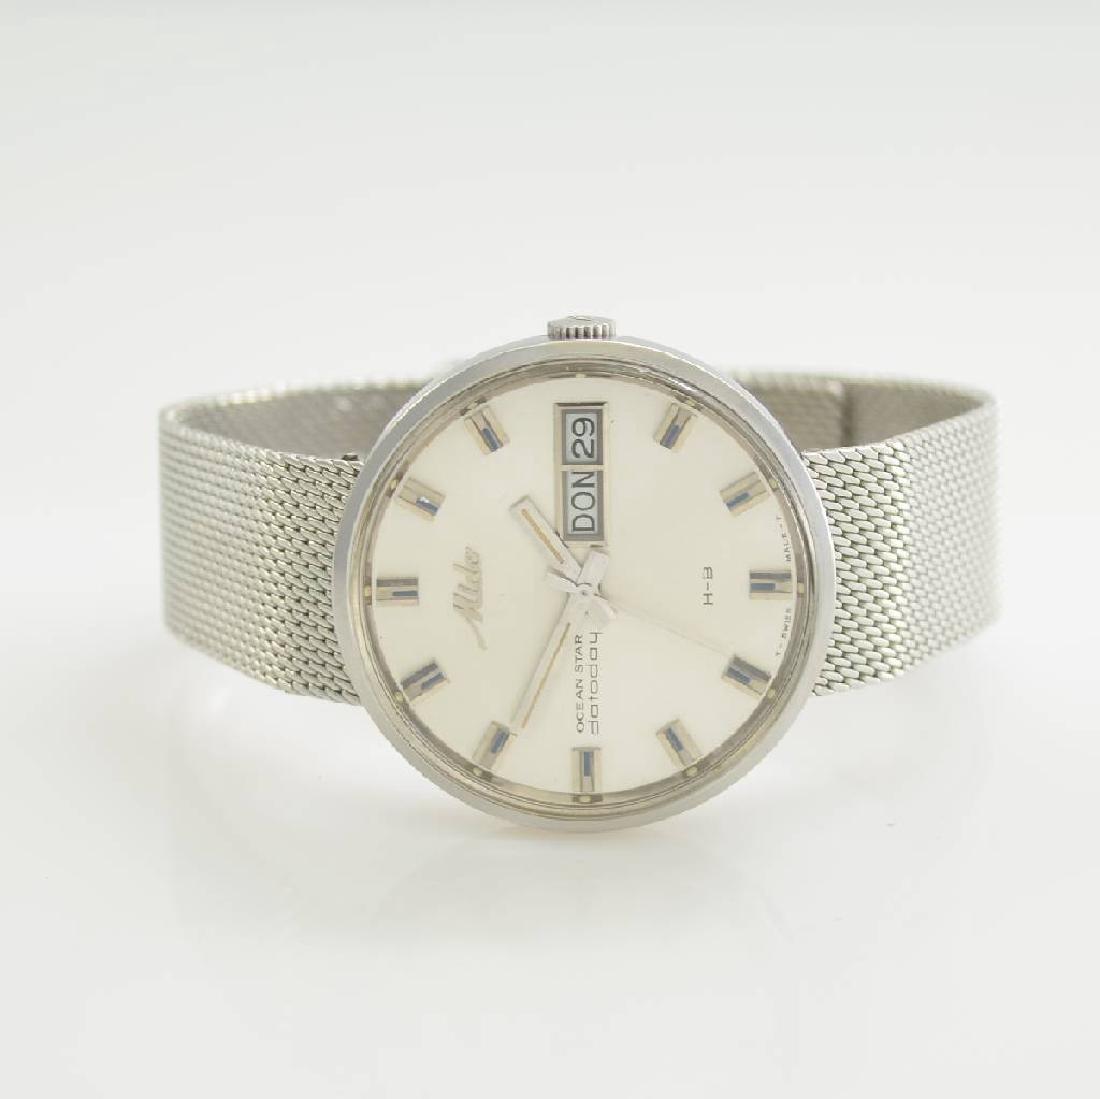 MIDO Ocean Star datoday gents wristwatch H-B